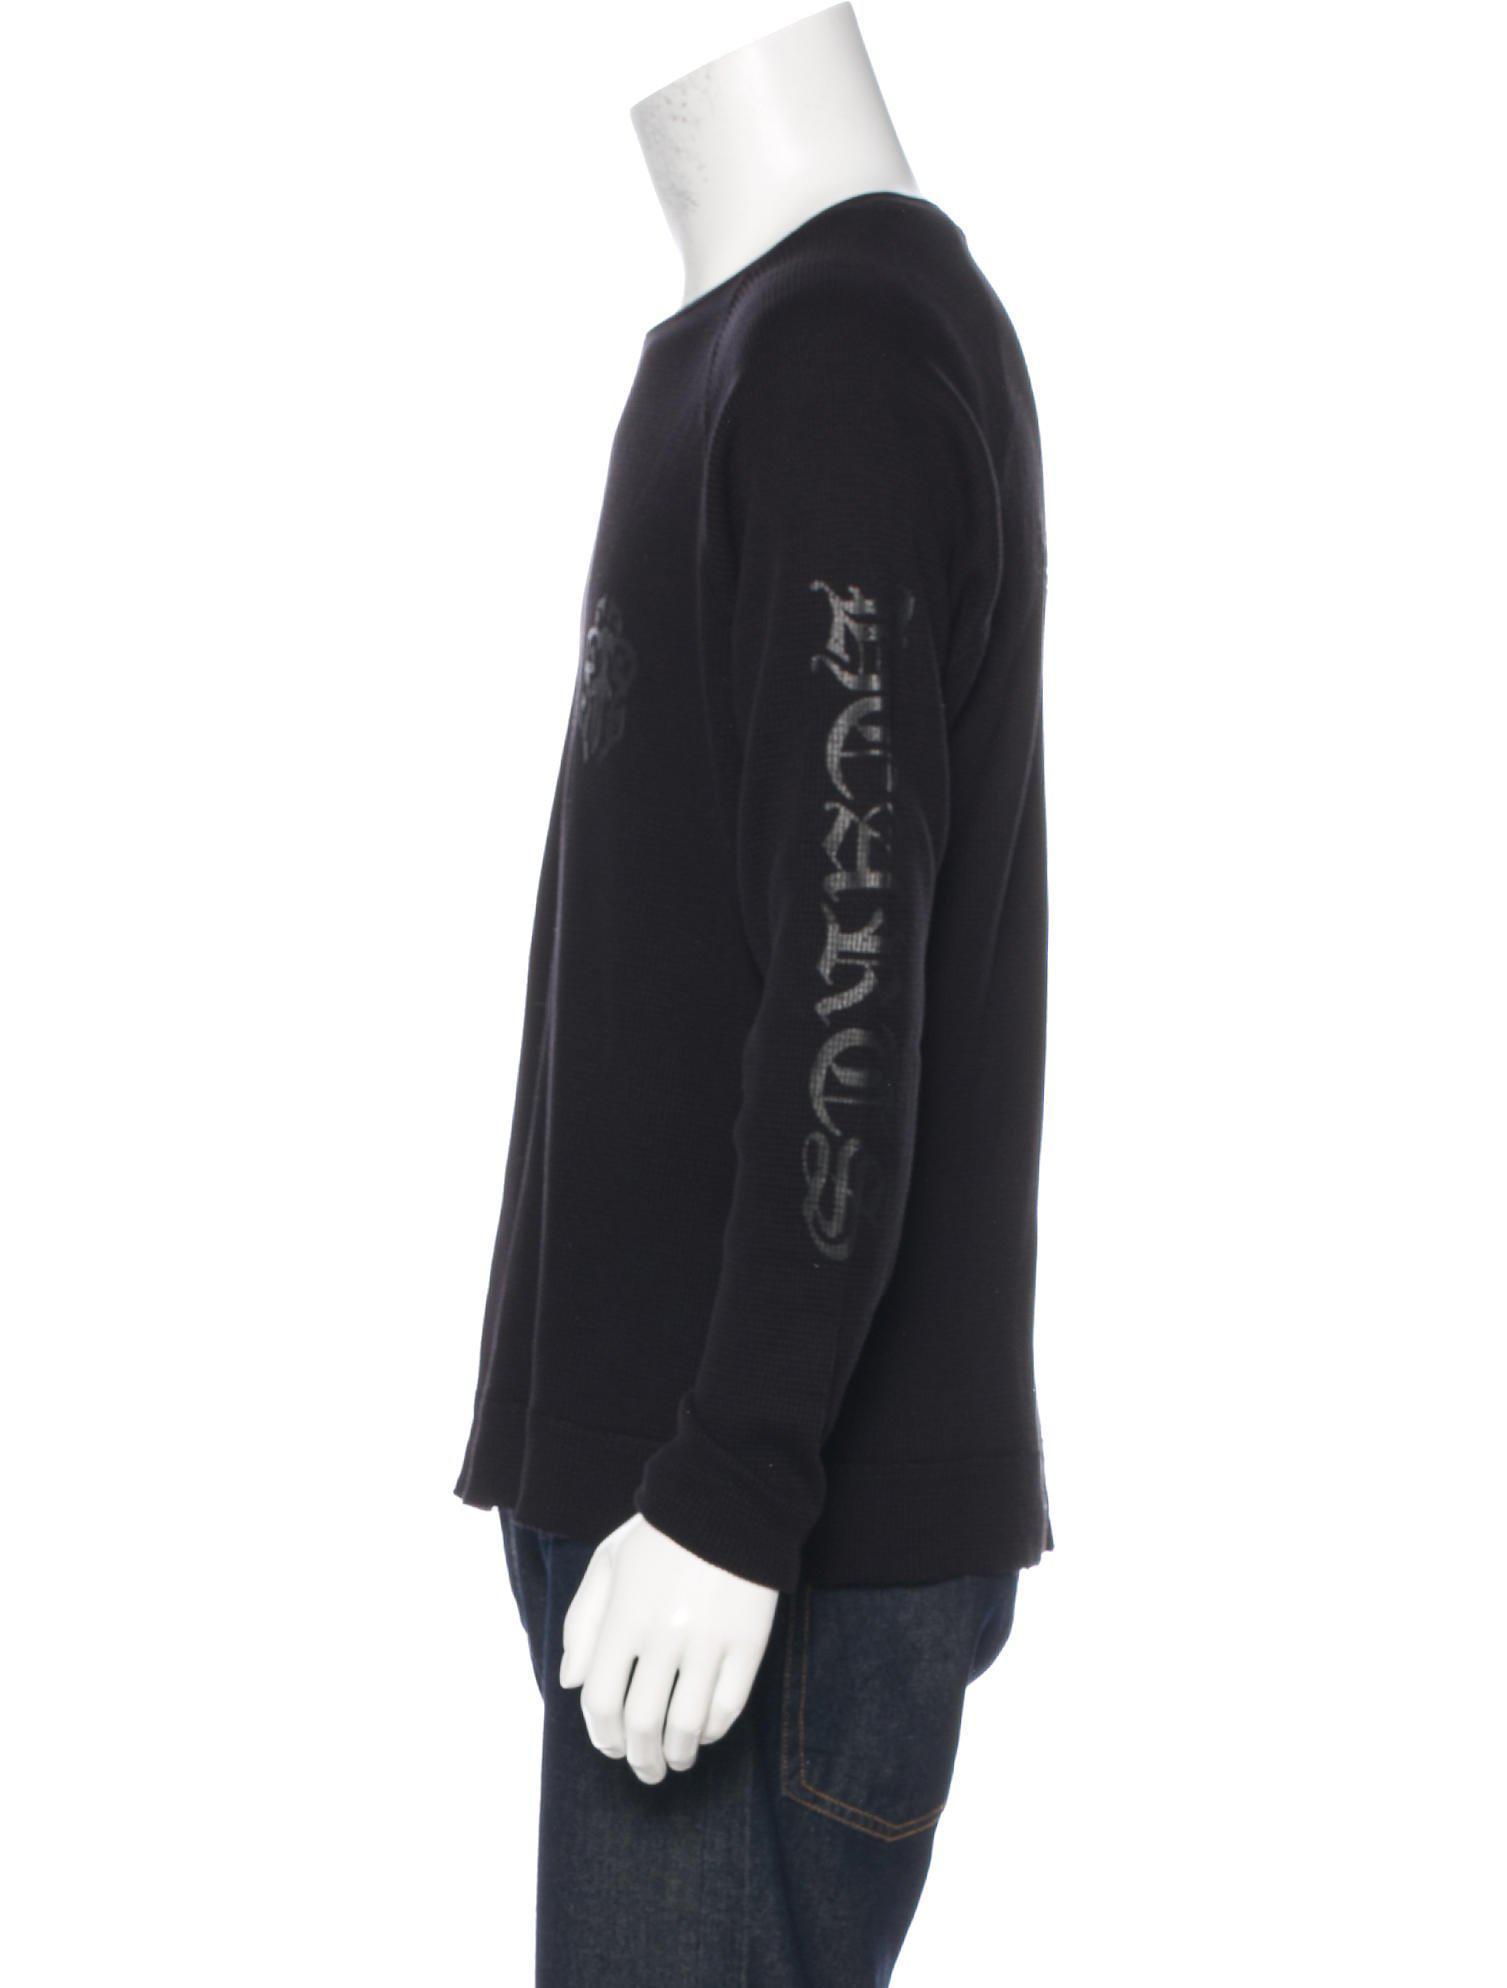 ae417a0dfdd6 Chrome Hearts - Black Long Sleeve Thermal T-shirt for Men - Lyst. View  fullscreen